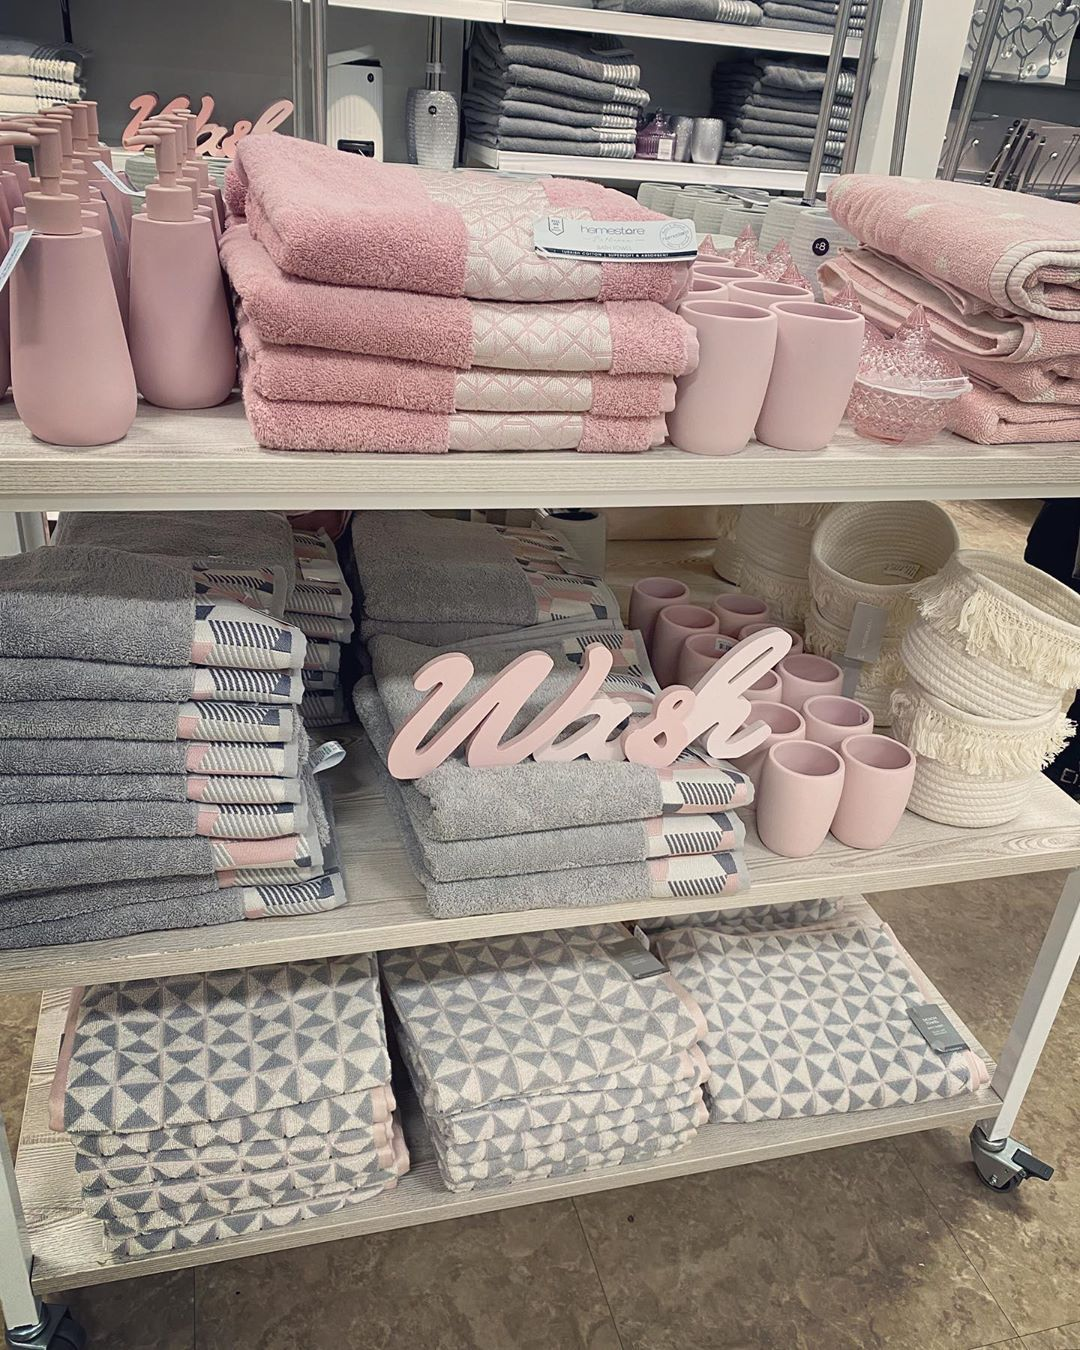 Rachel On Instagram Loving This Pink And Grey Bathroom Collection In Shopmatalan Bathroom Pink Bathroom Decor Apartment Decor Bathroom Collections [ 1350 x 1080 Pixel ]